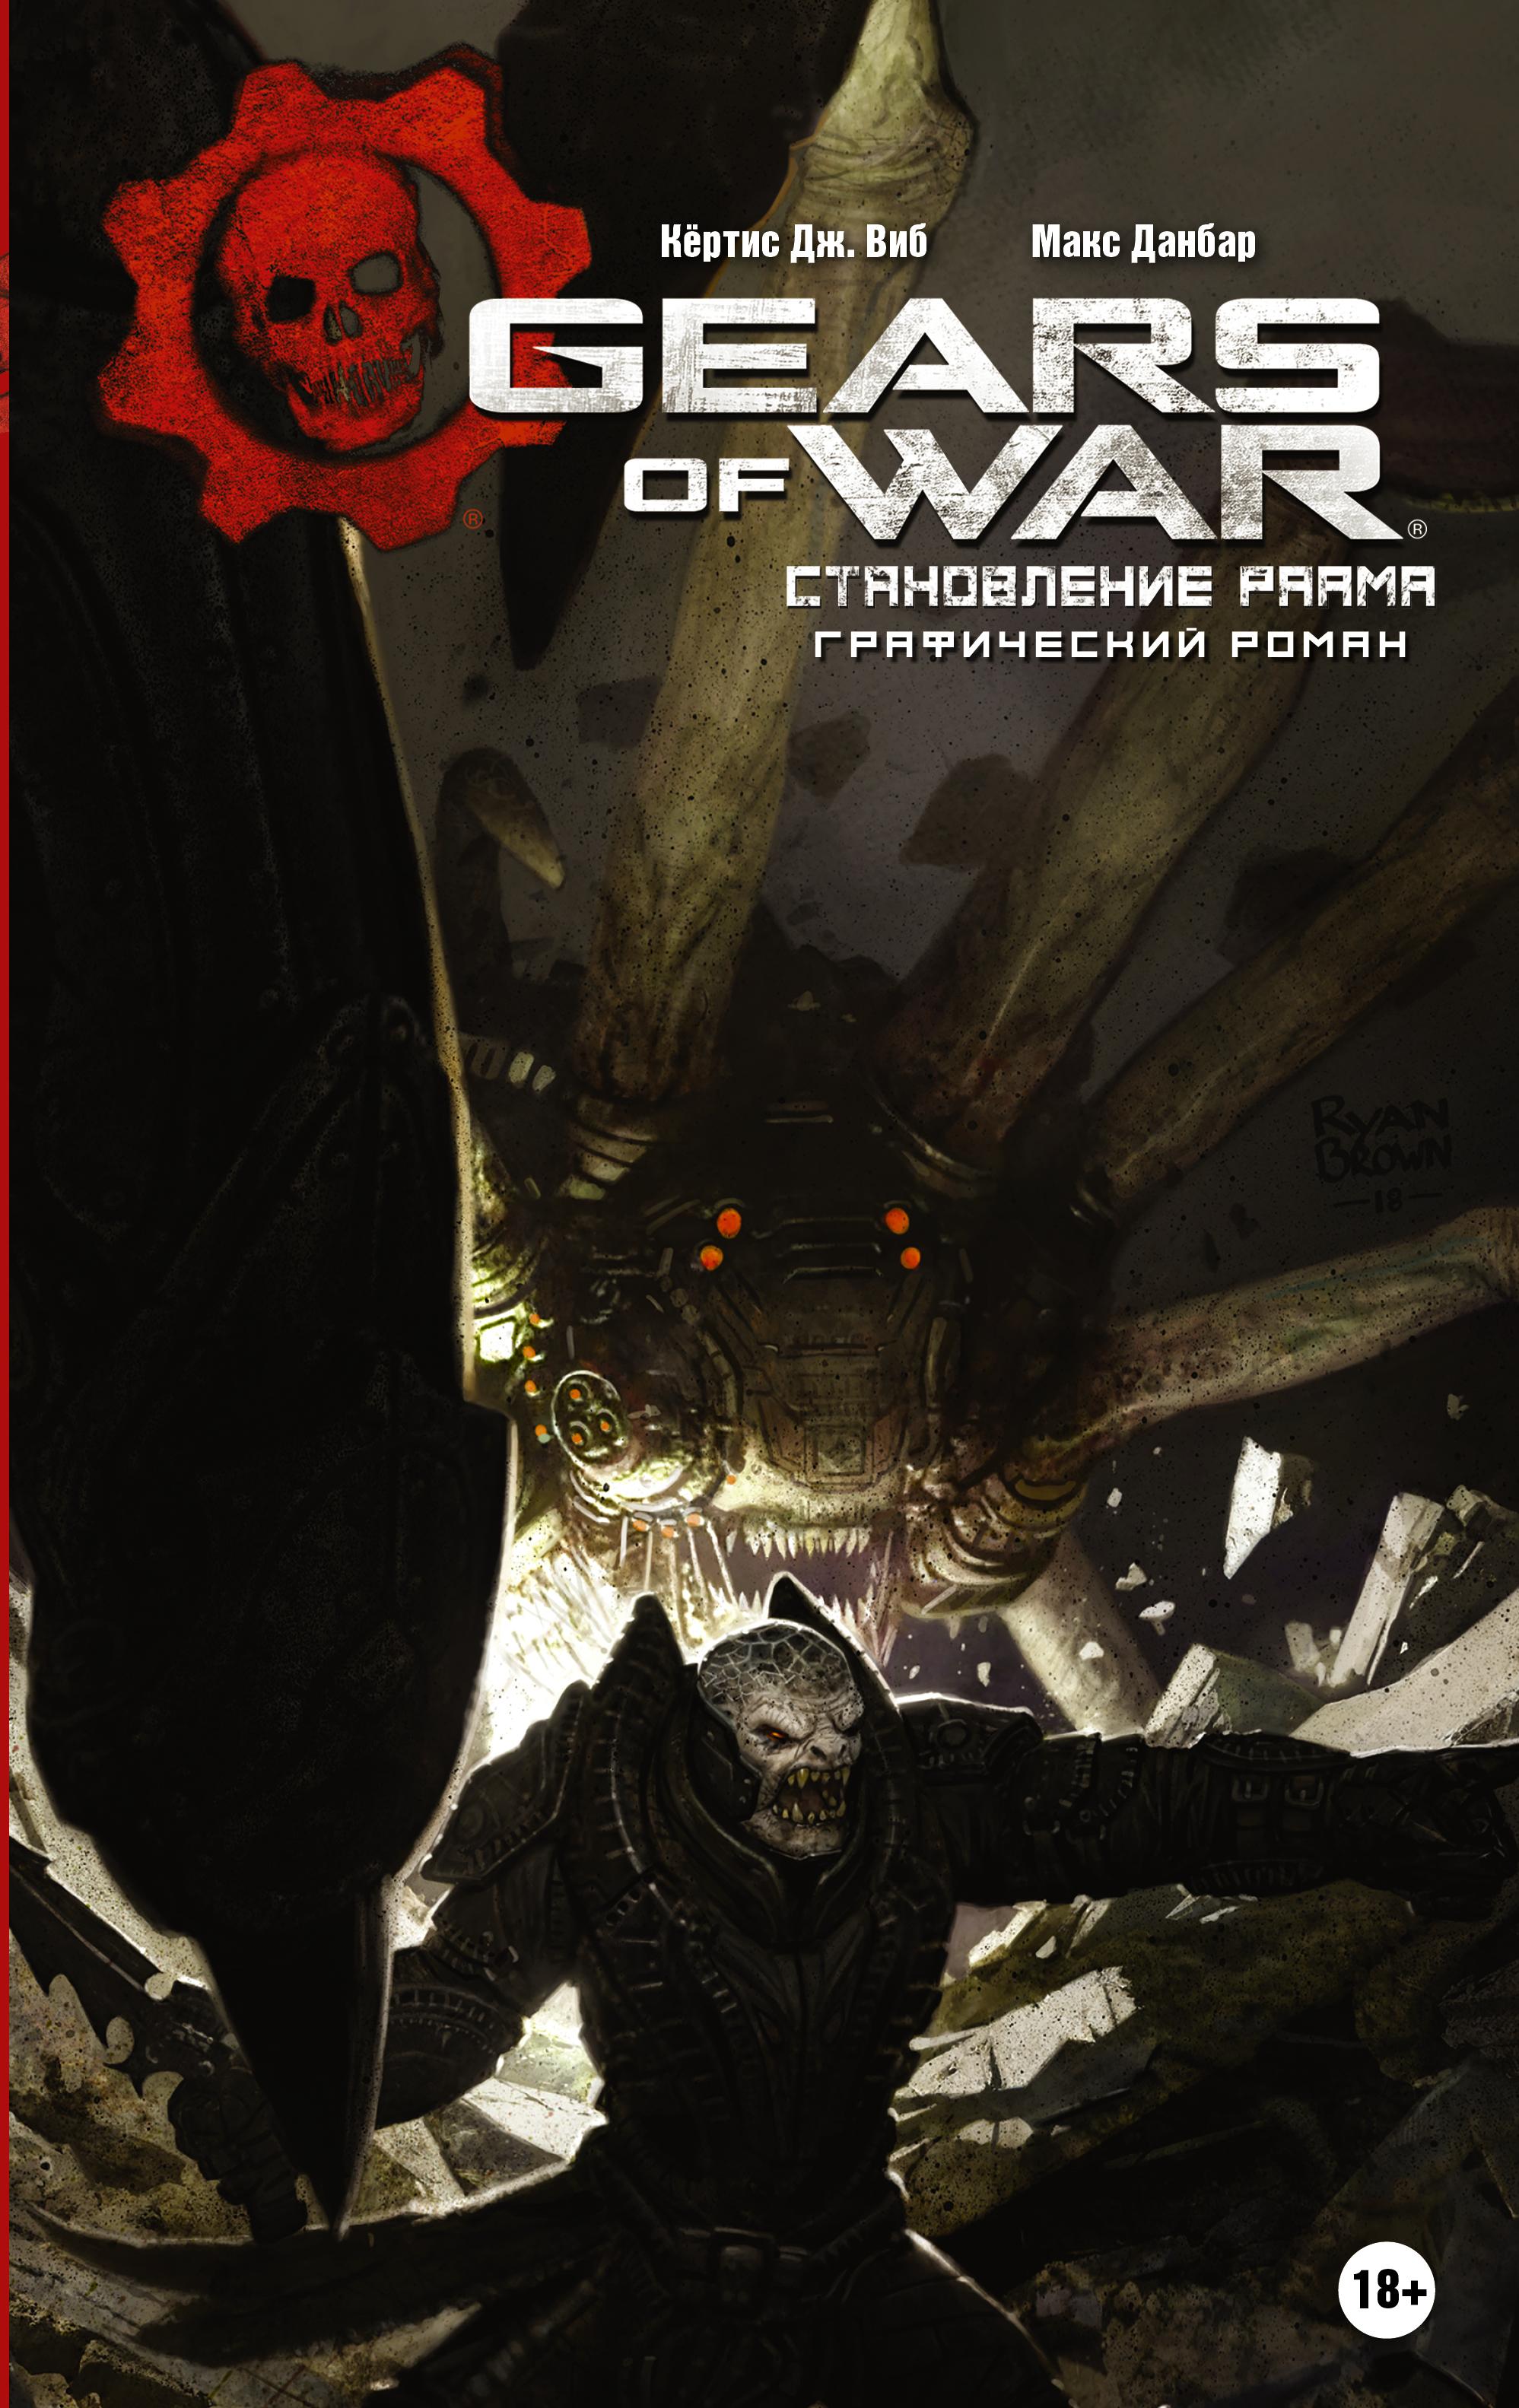 Кёртис Дж. Виб, Макс Данбар Gears of War. Становление РААМа данбар